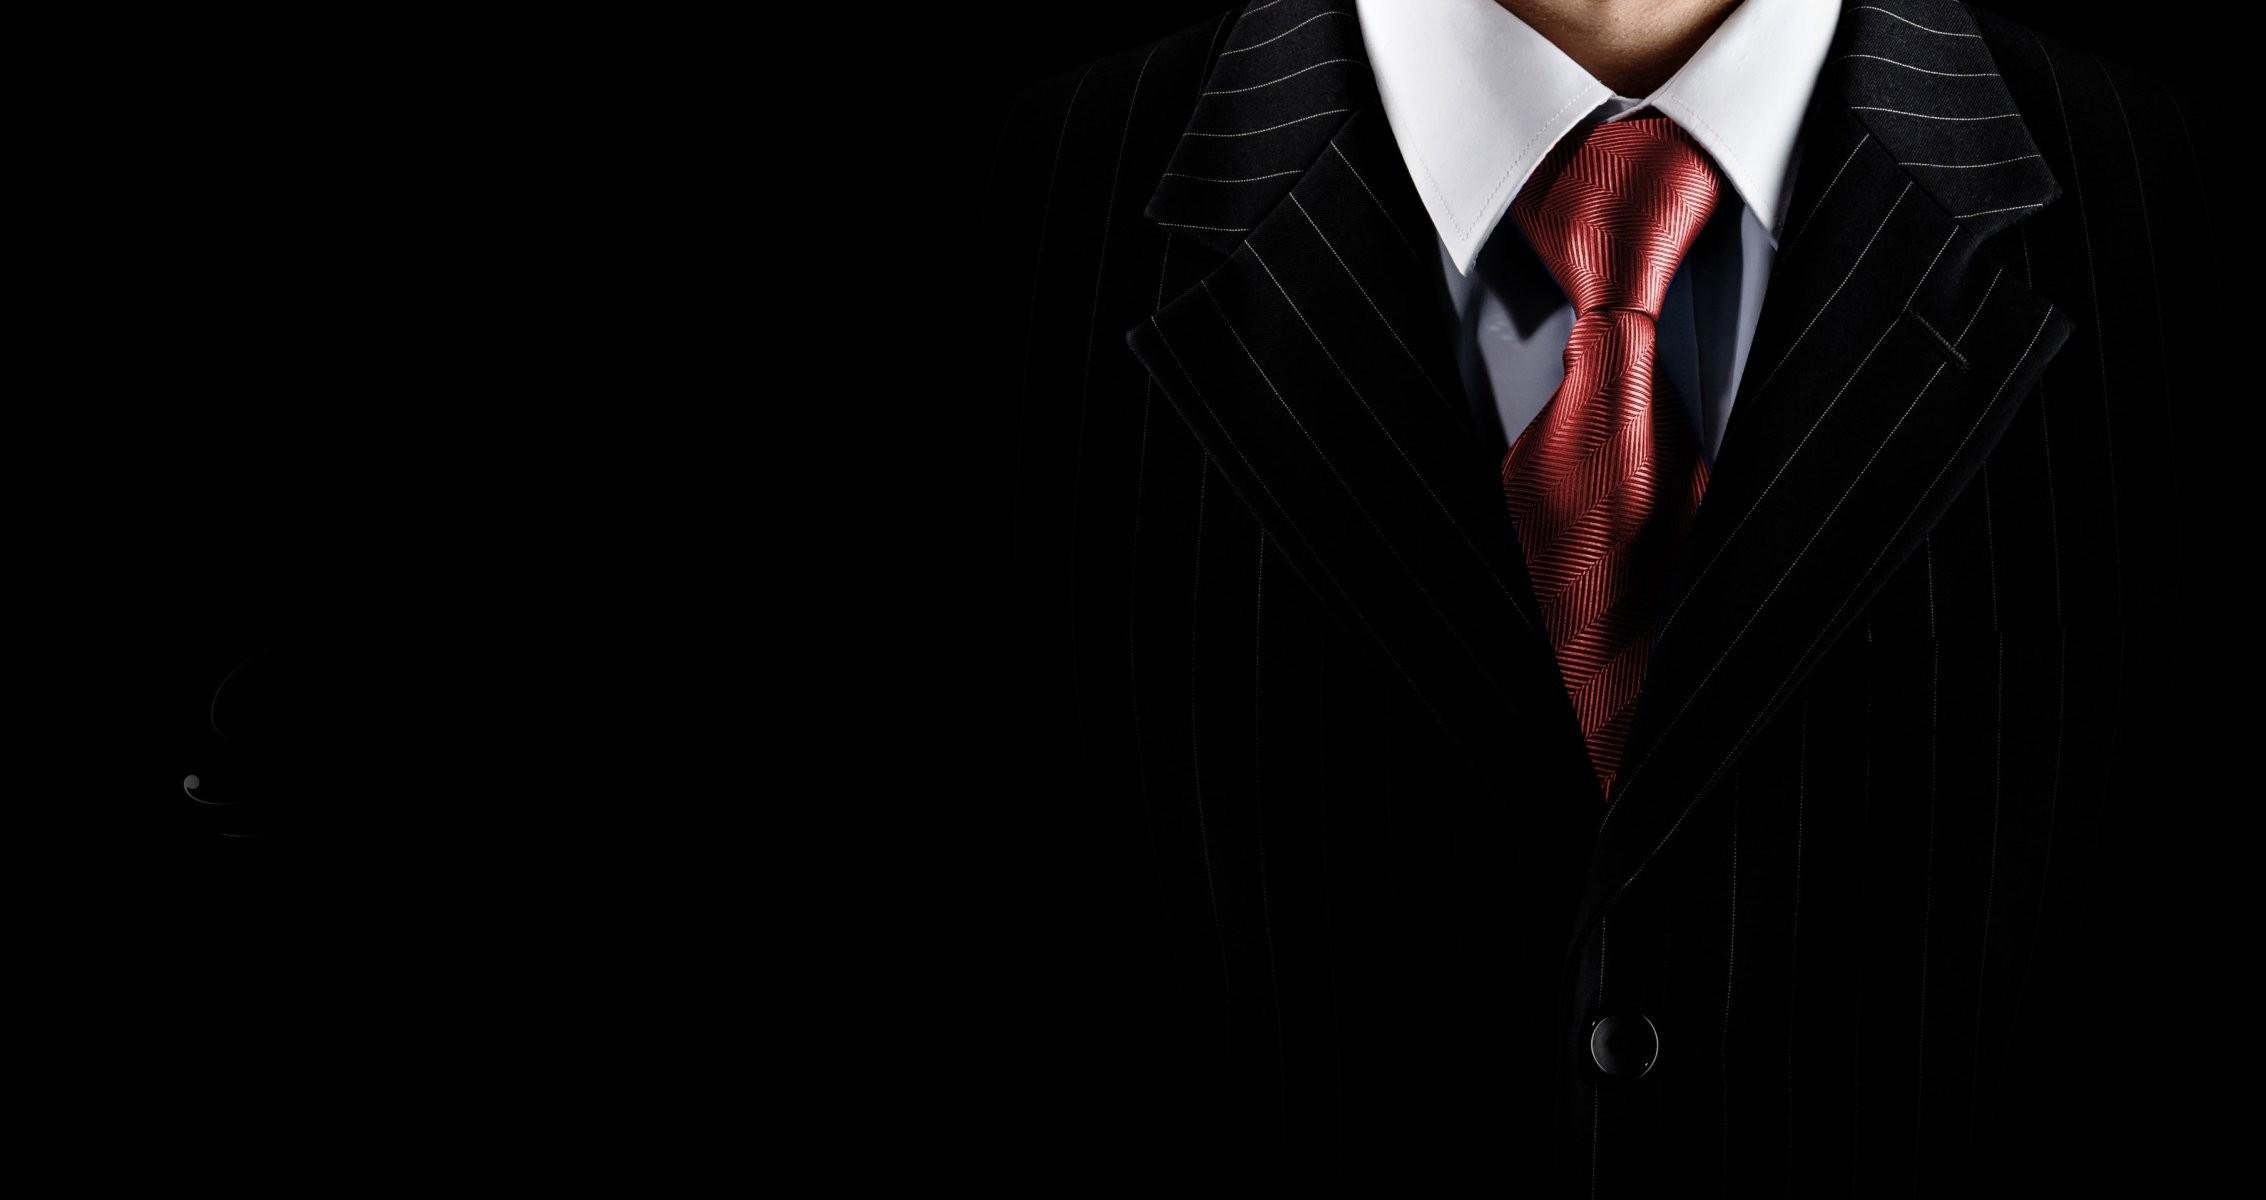 suit tie elegance shirt